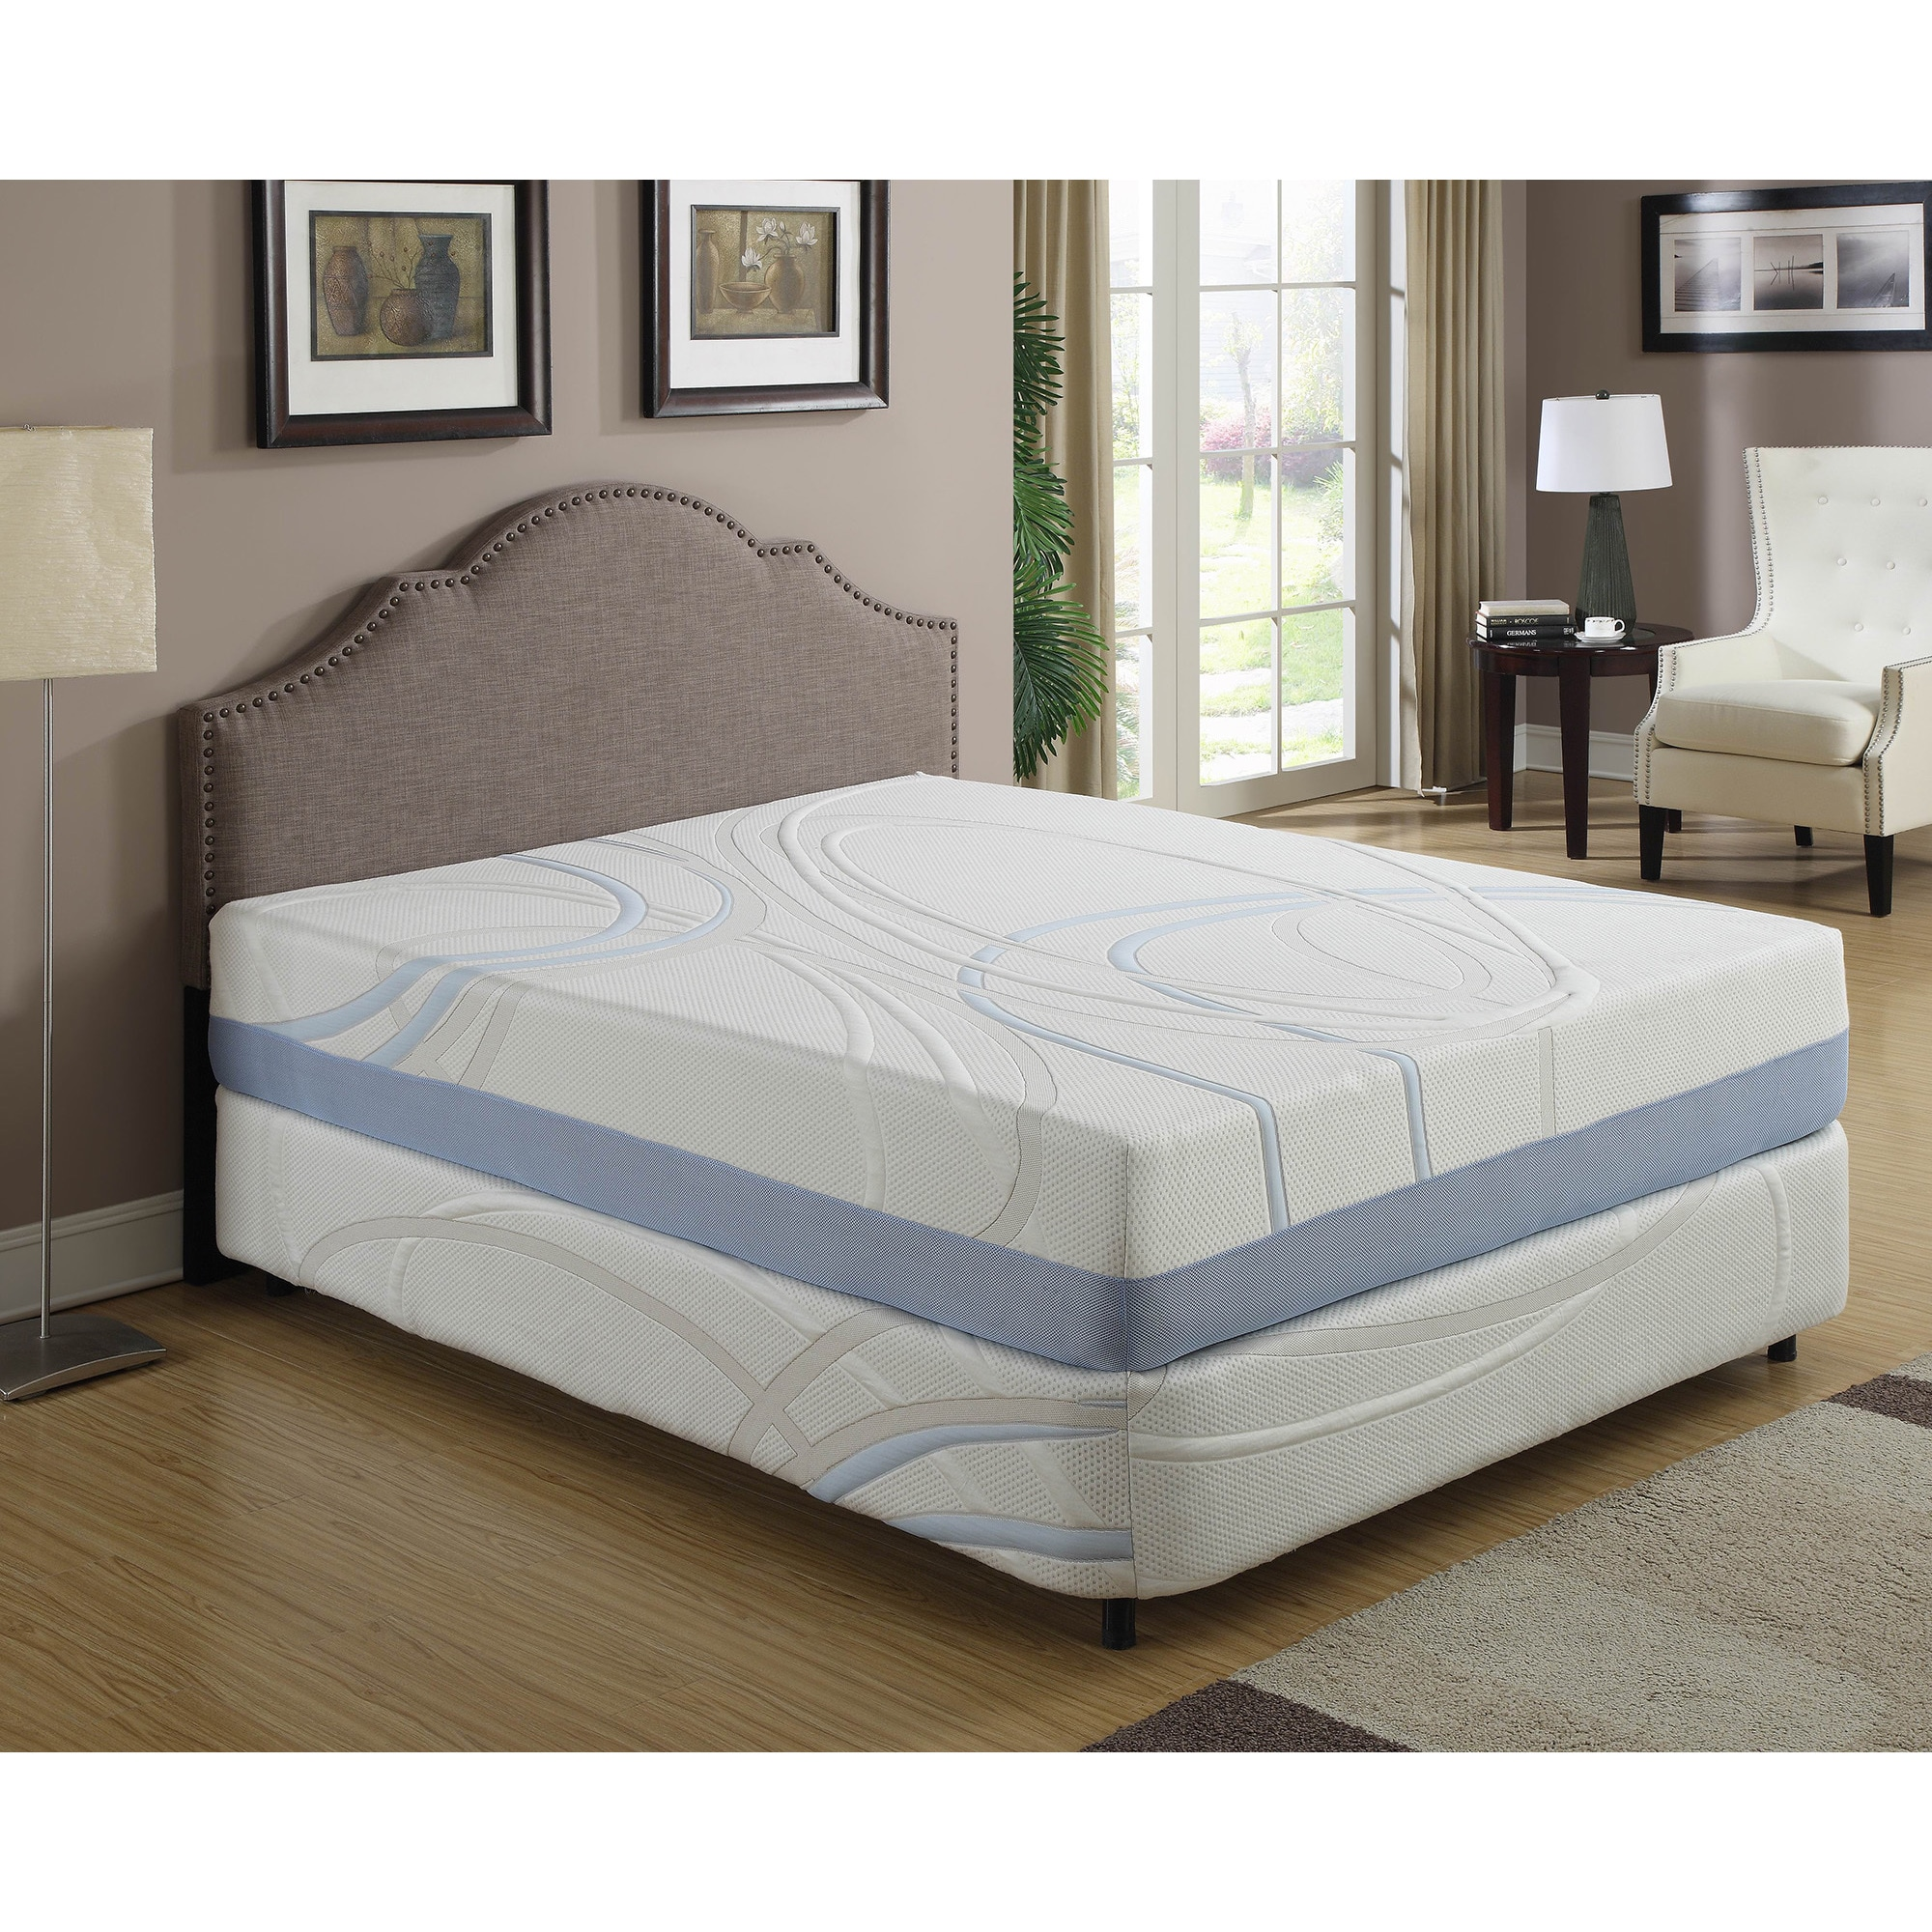 visco id product profileid science ara imageservice mattress sleep king recipeid cal memory foam